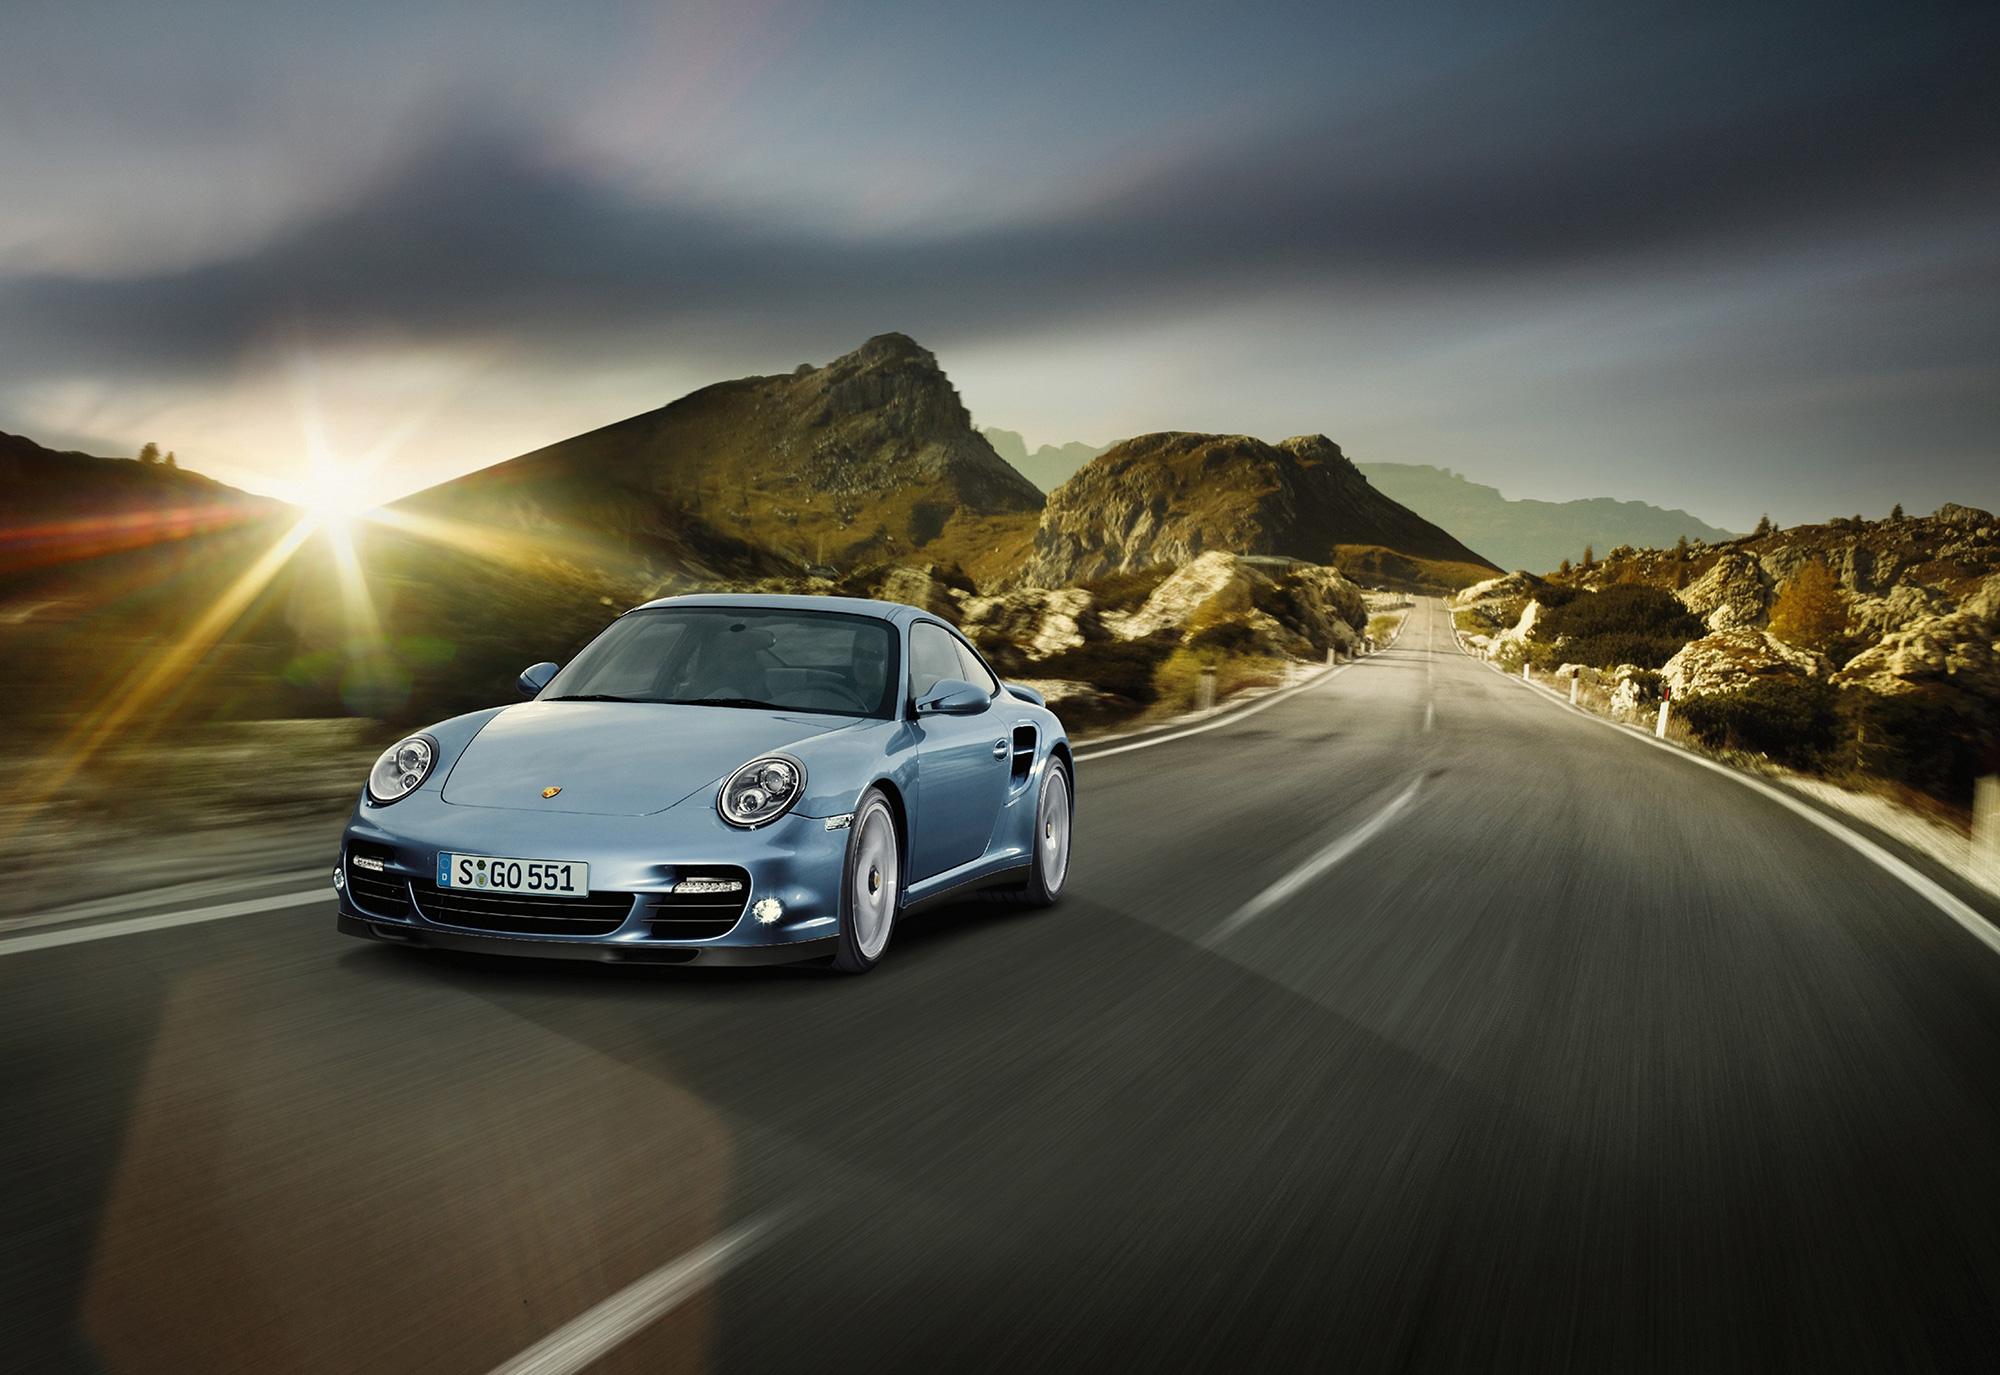 2012-Porsche-997-Turbo-S.jpg